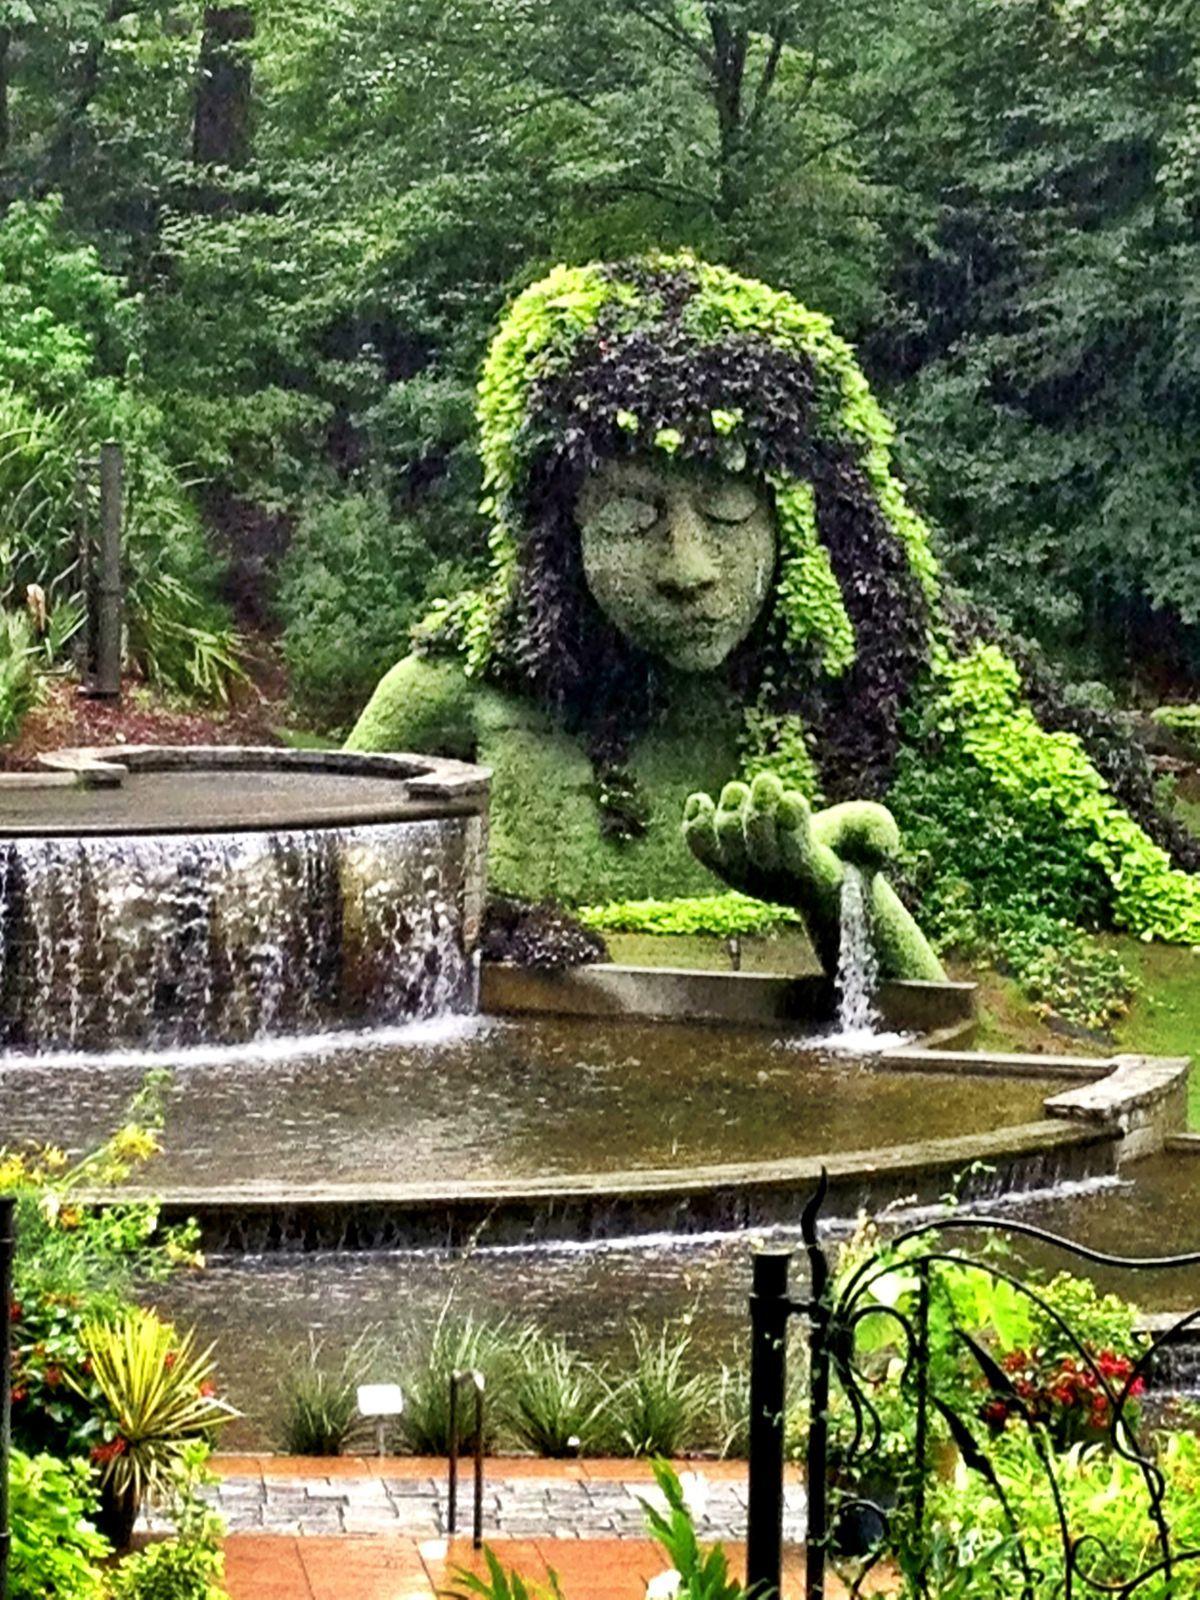 A448f1636dd39a2fe0d7c0f10c160c69.jpg 1,200×1,600 Pixels | Grow ... Lebendige Skulpturen Im Garten Atlanta